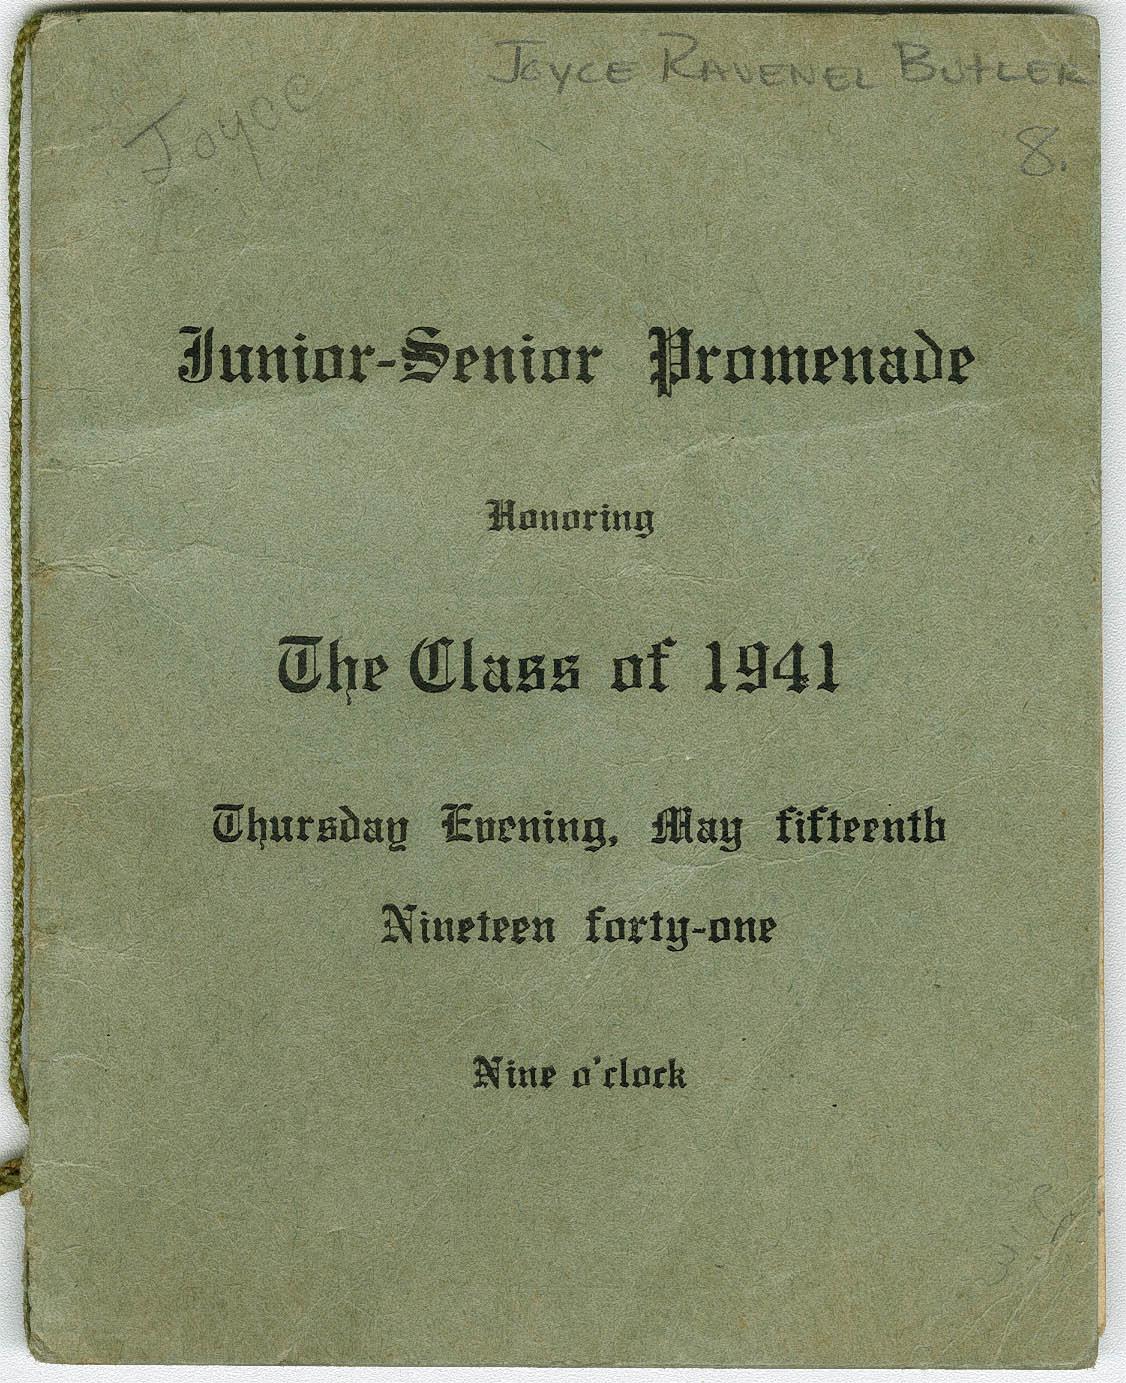 Program for Junior-Senior Promenade.